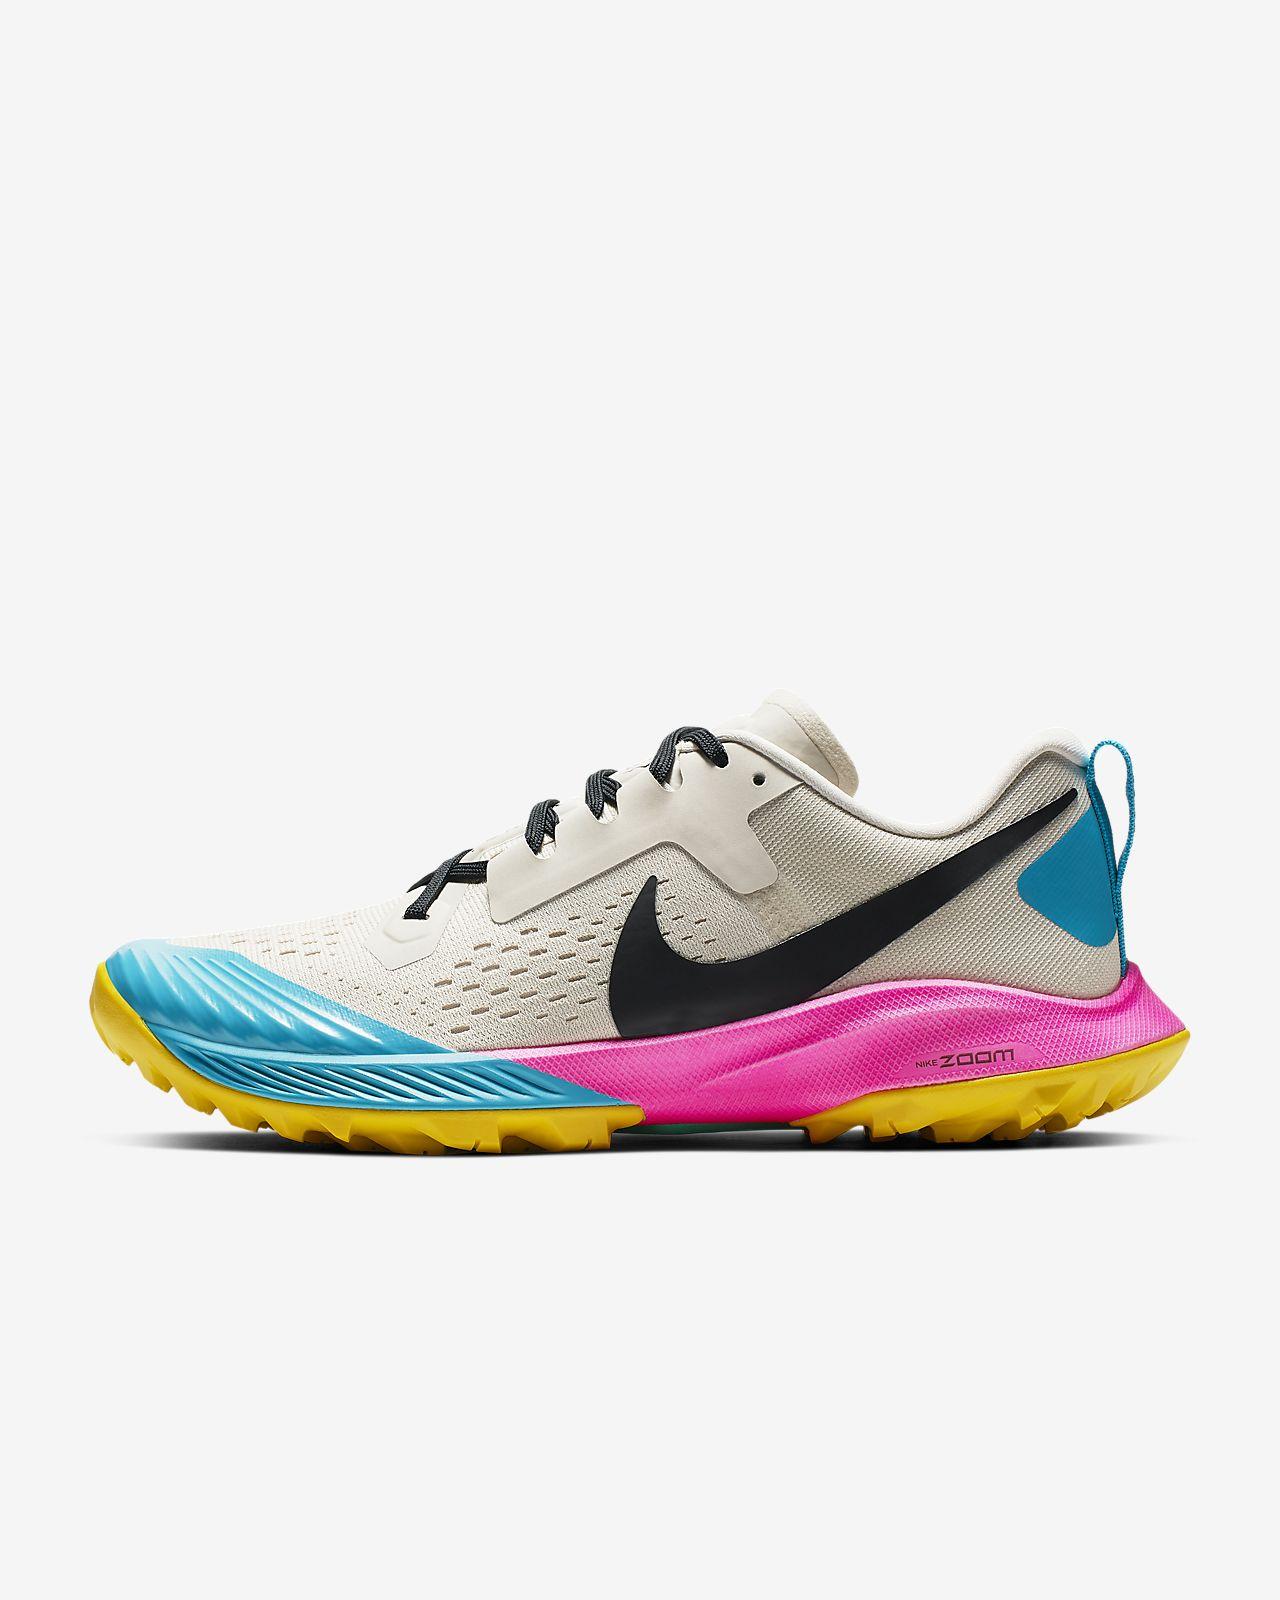 info for 5e8d1 ab7bd ... Chaussure de running Nike Air Zoom Terra Kiger 5 pour Femme